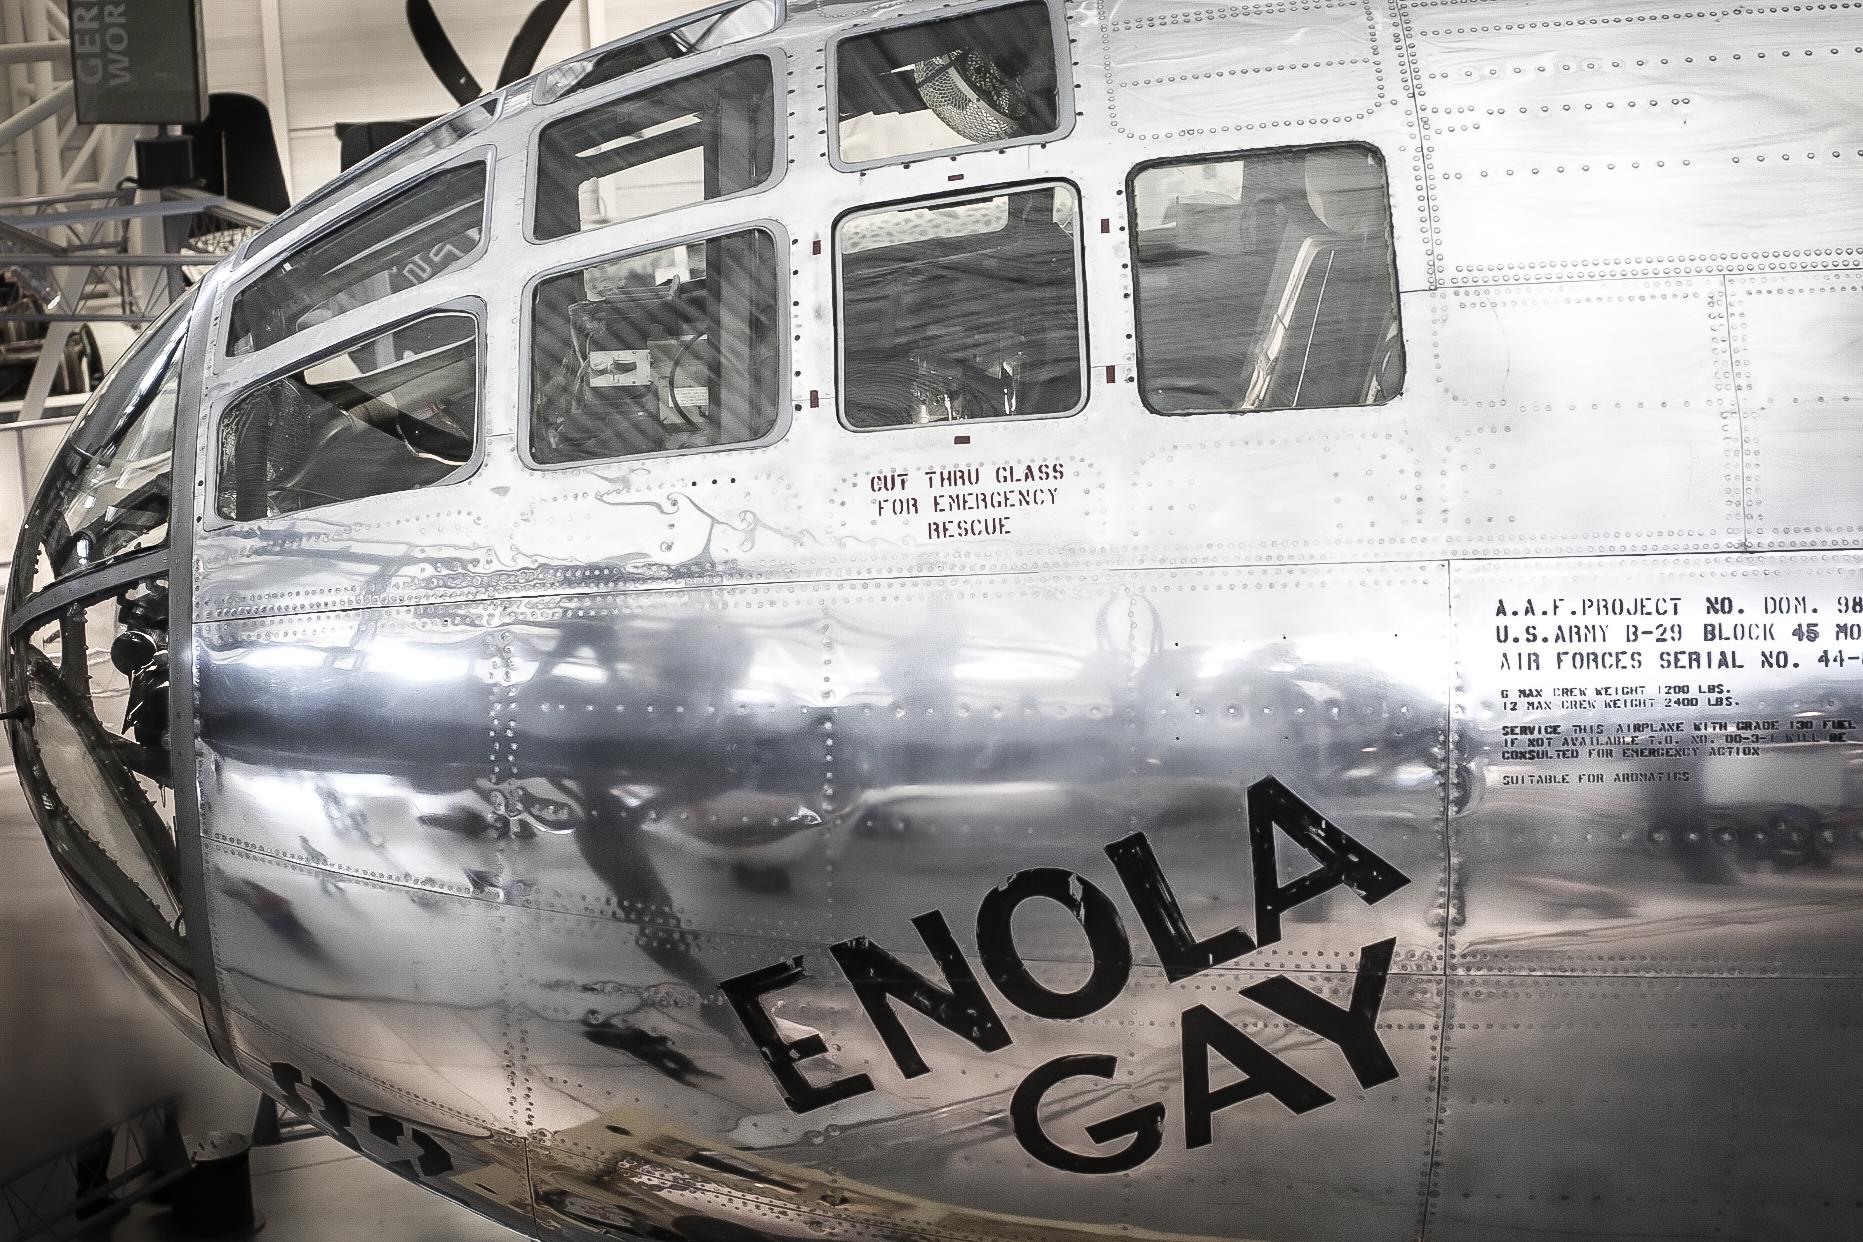 The Enola Gay rests at the Smithsonian Udvar-Hazy Air and Space Museum near Washington D.C. NotSoSAHM